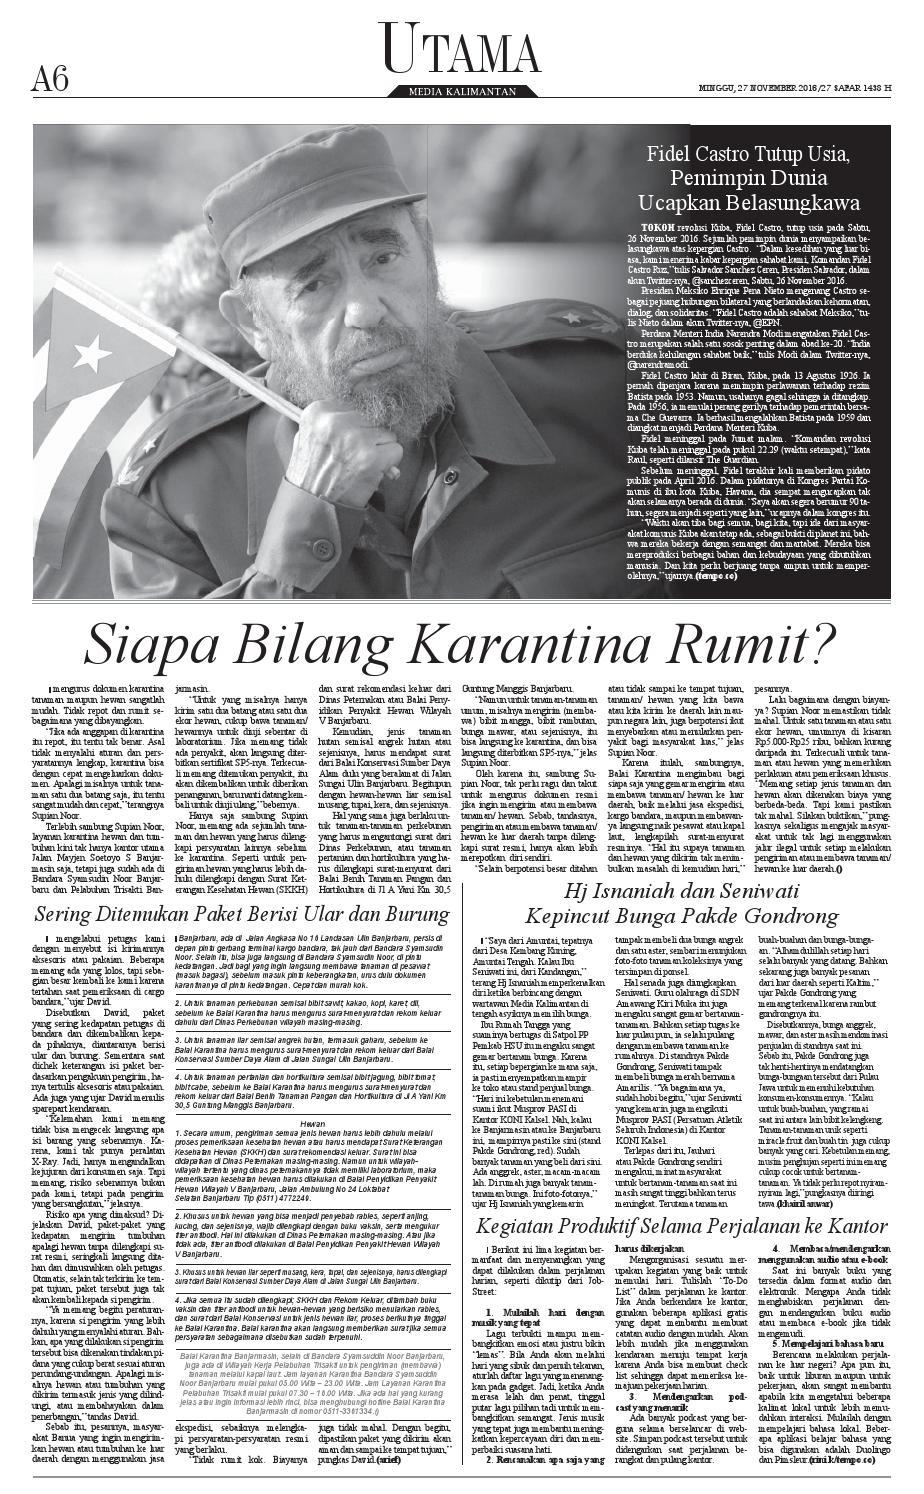 Media Kalimantan Minggu 27 November 2016 By Issuu Surat Balai Karantina Untuk Tanaman Dan Hewan